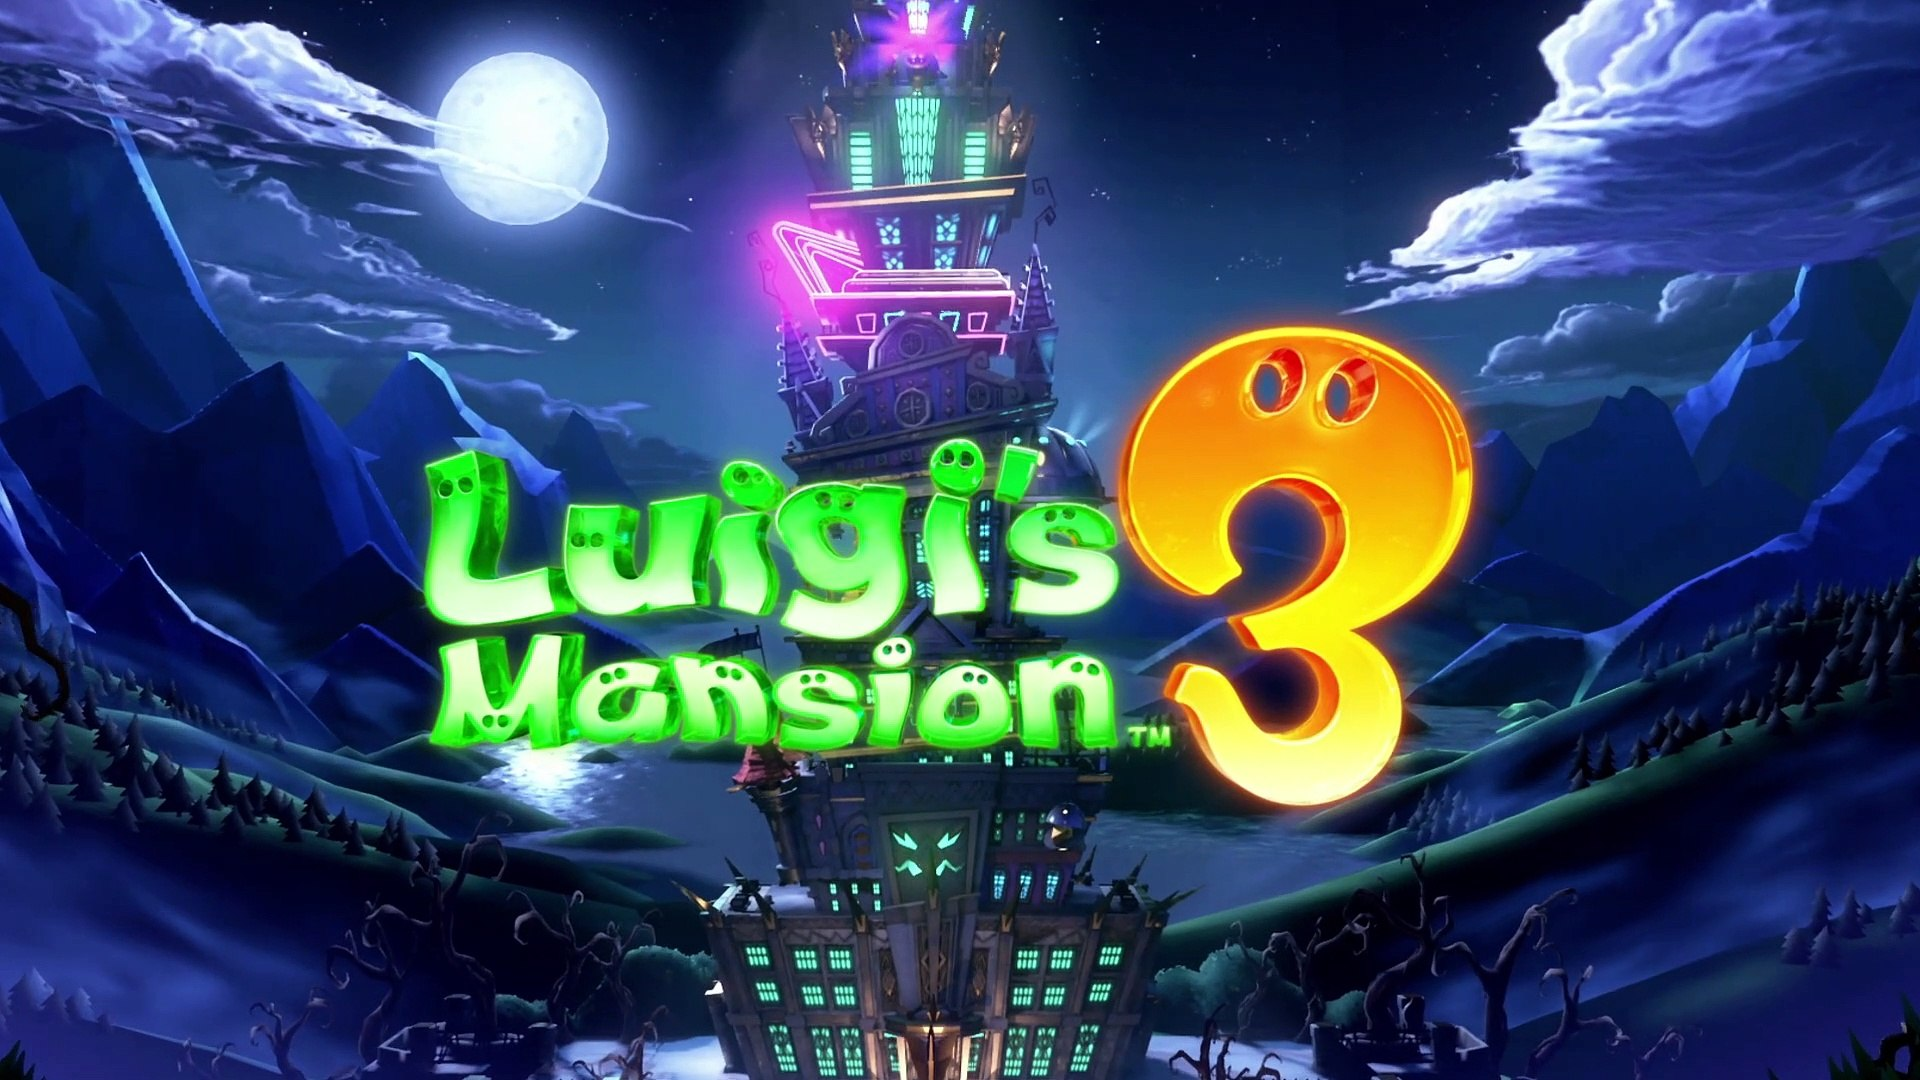 Luigi's Mansion 3 - Nintendo Switch Trailer - Nintendo | E3 2019